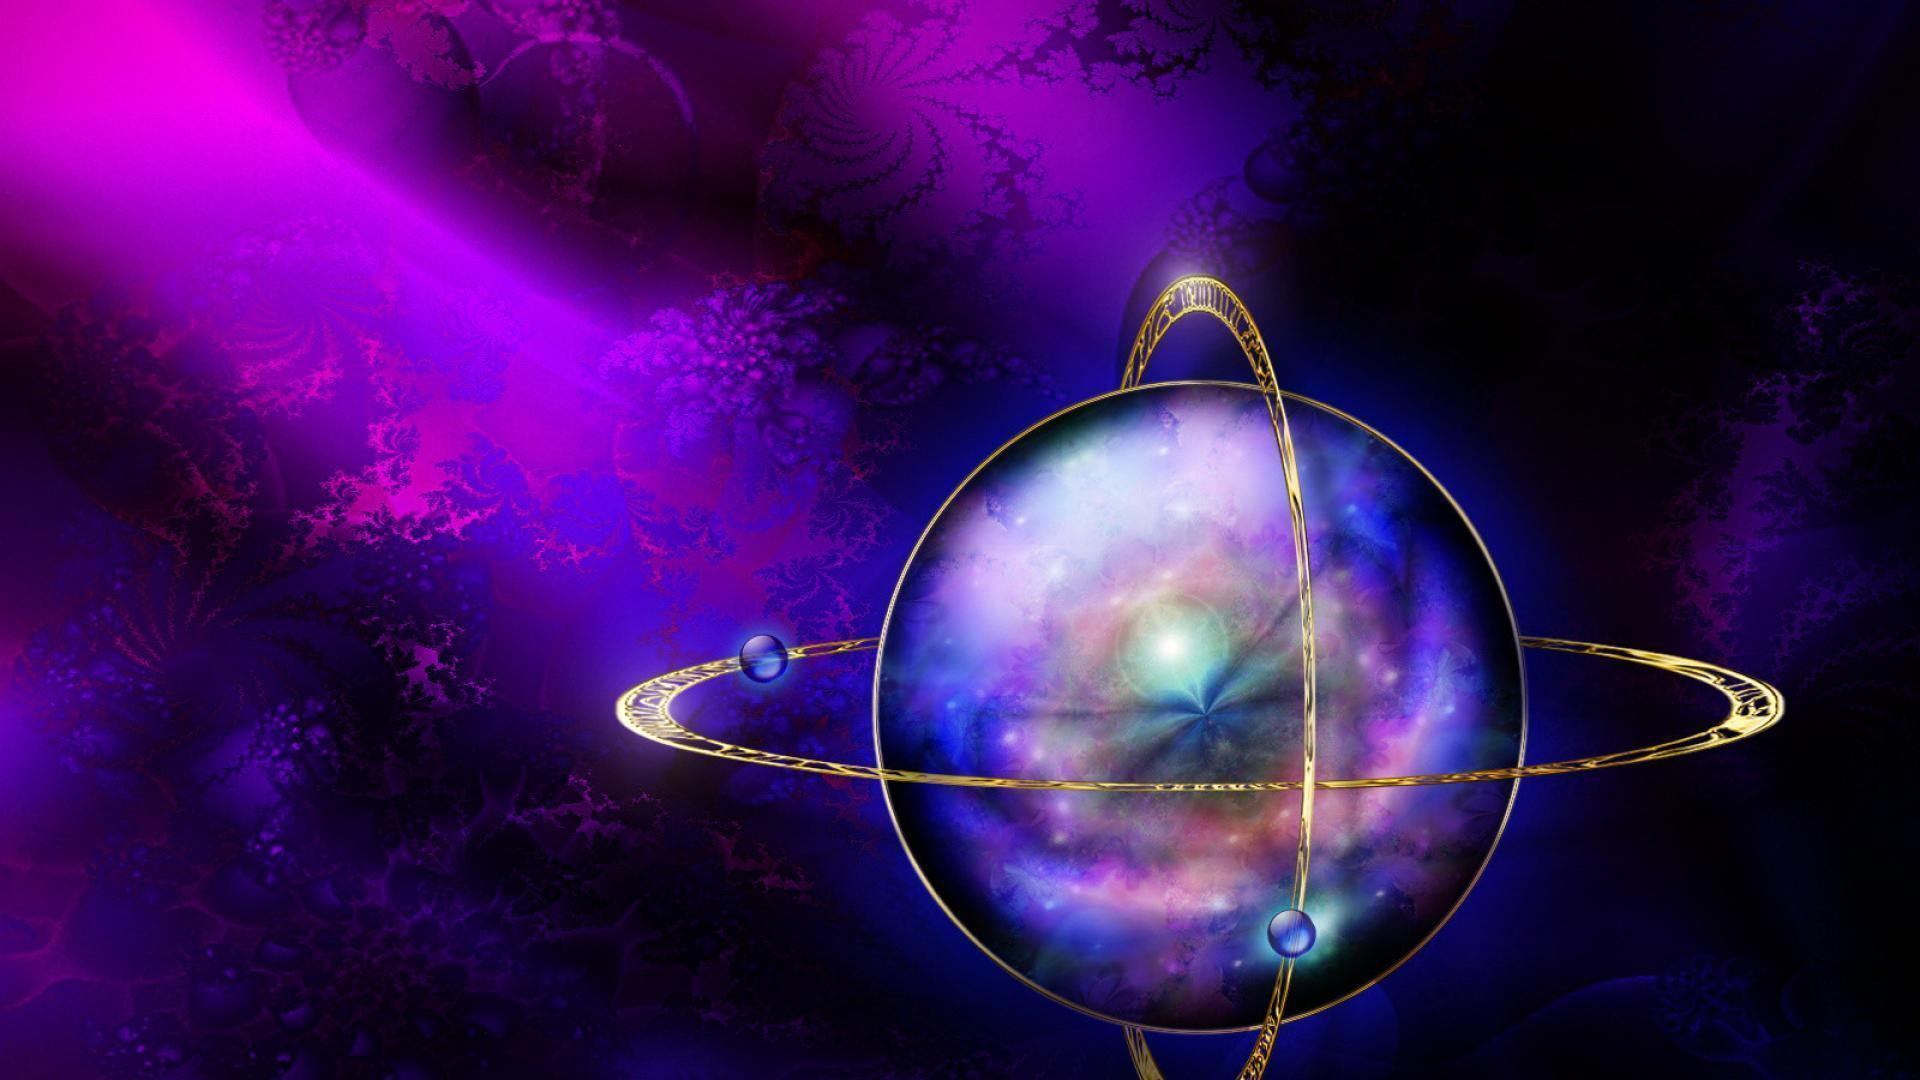 Purple Desktop Backgrounds